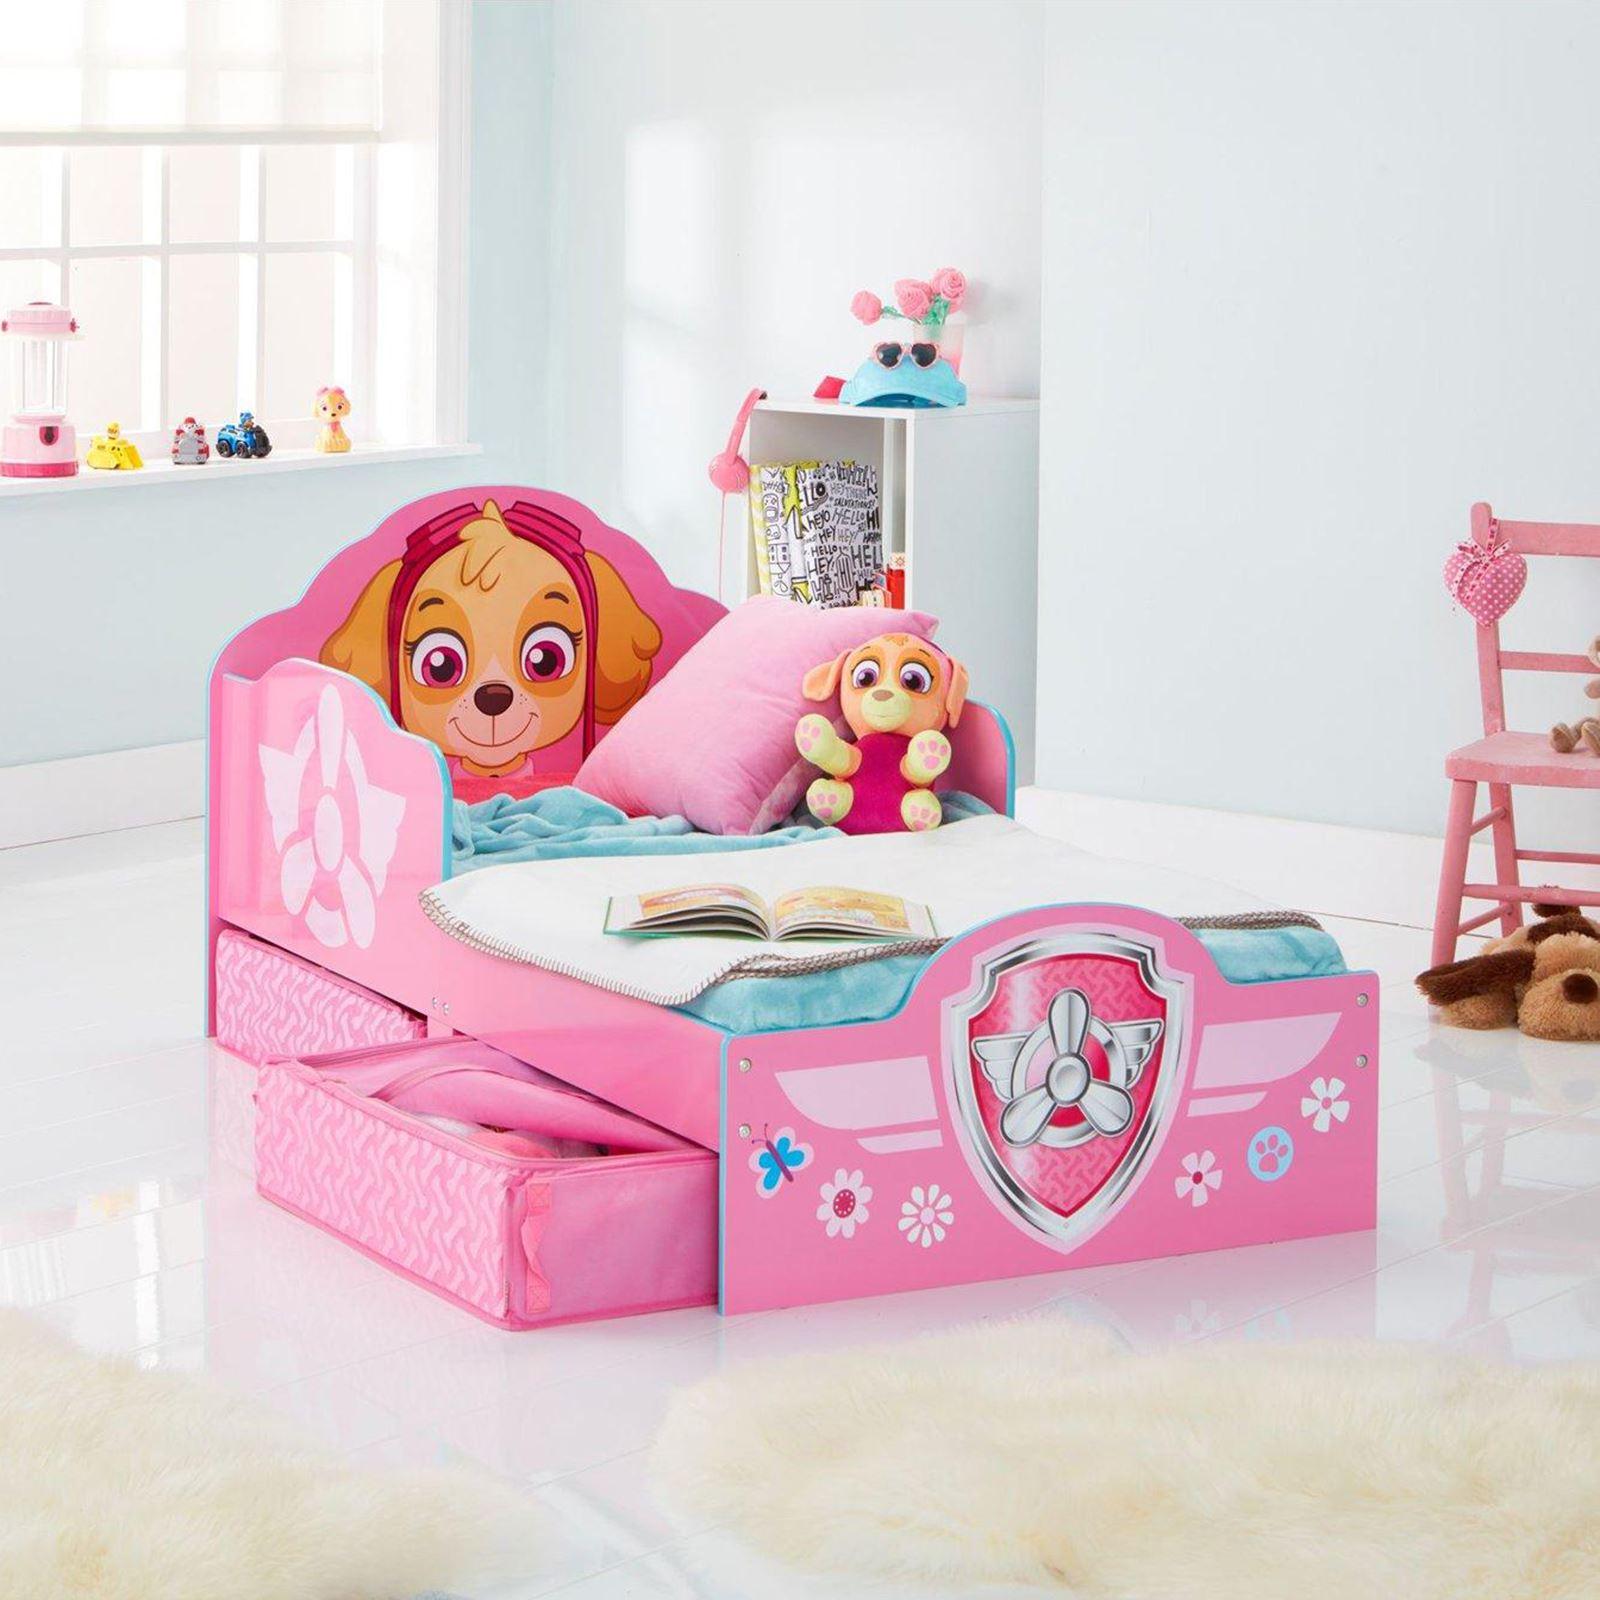 disney personnage b b junior lits avec rangement 3. Black Bedroom Furniture Sets. Home Design Ideas